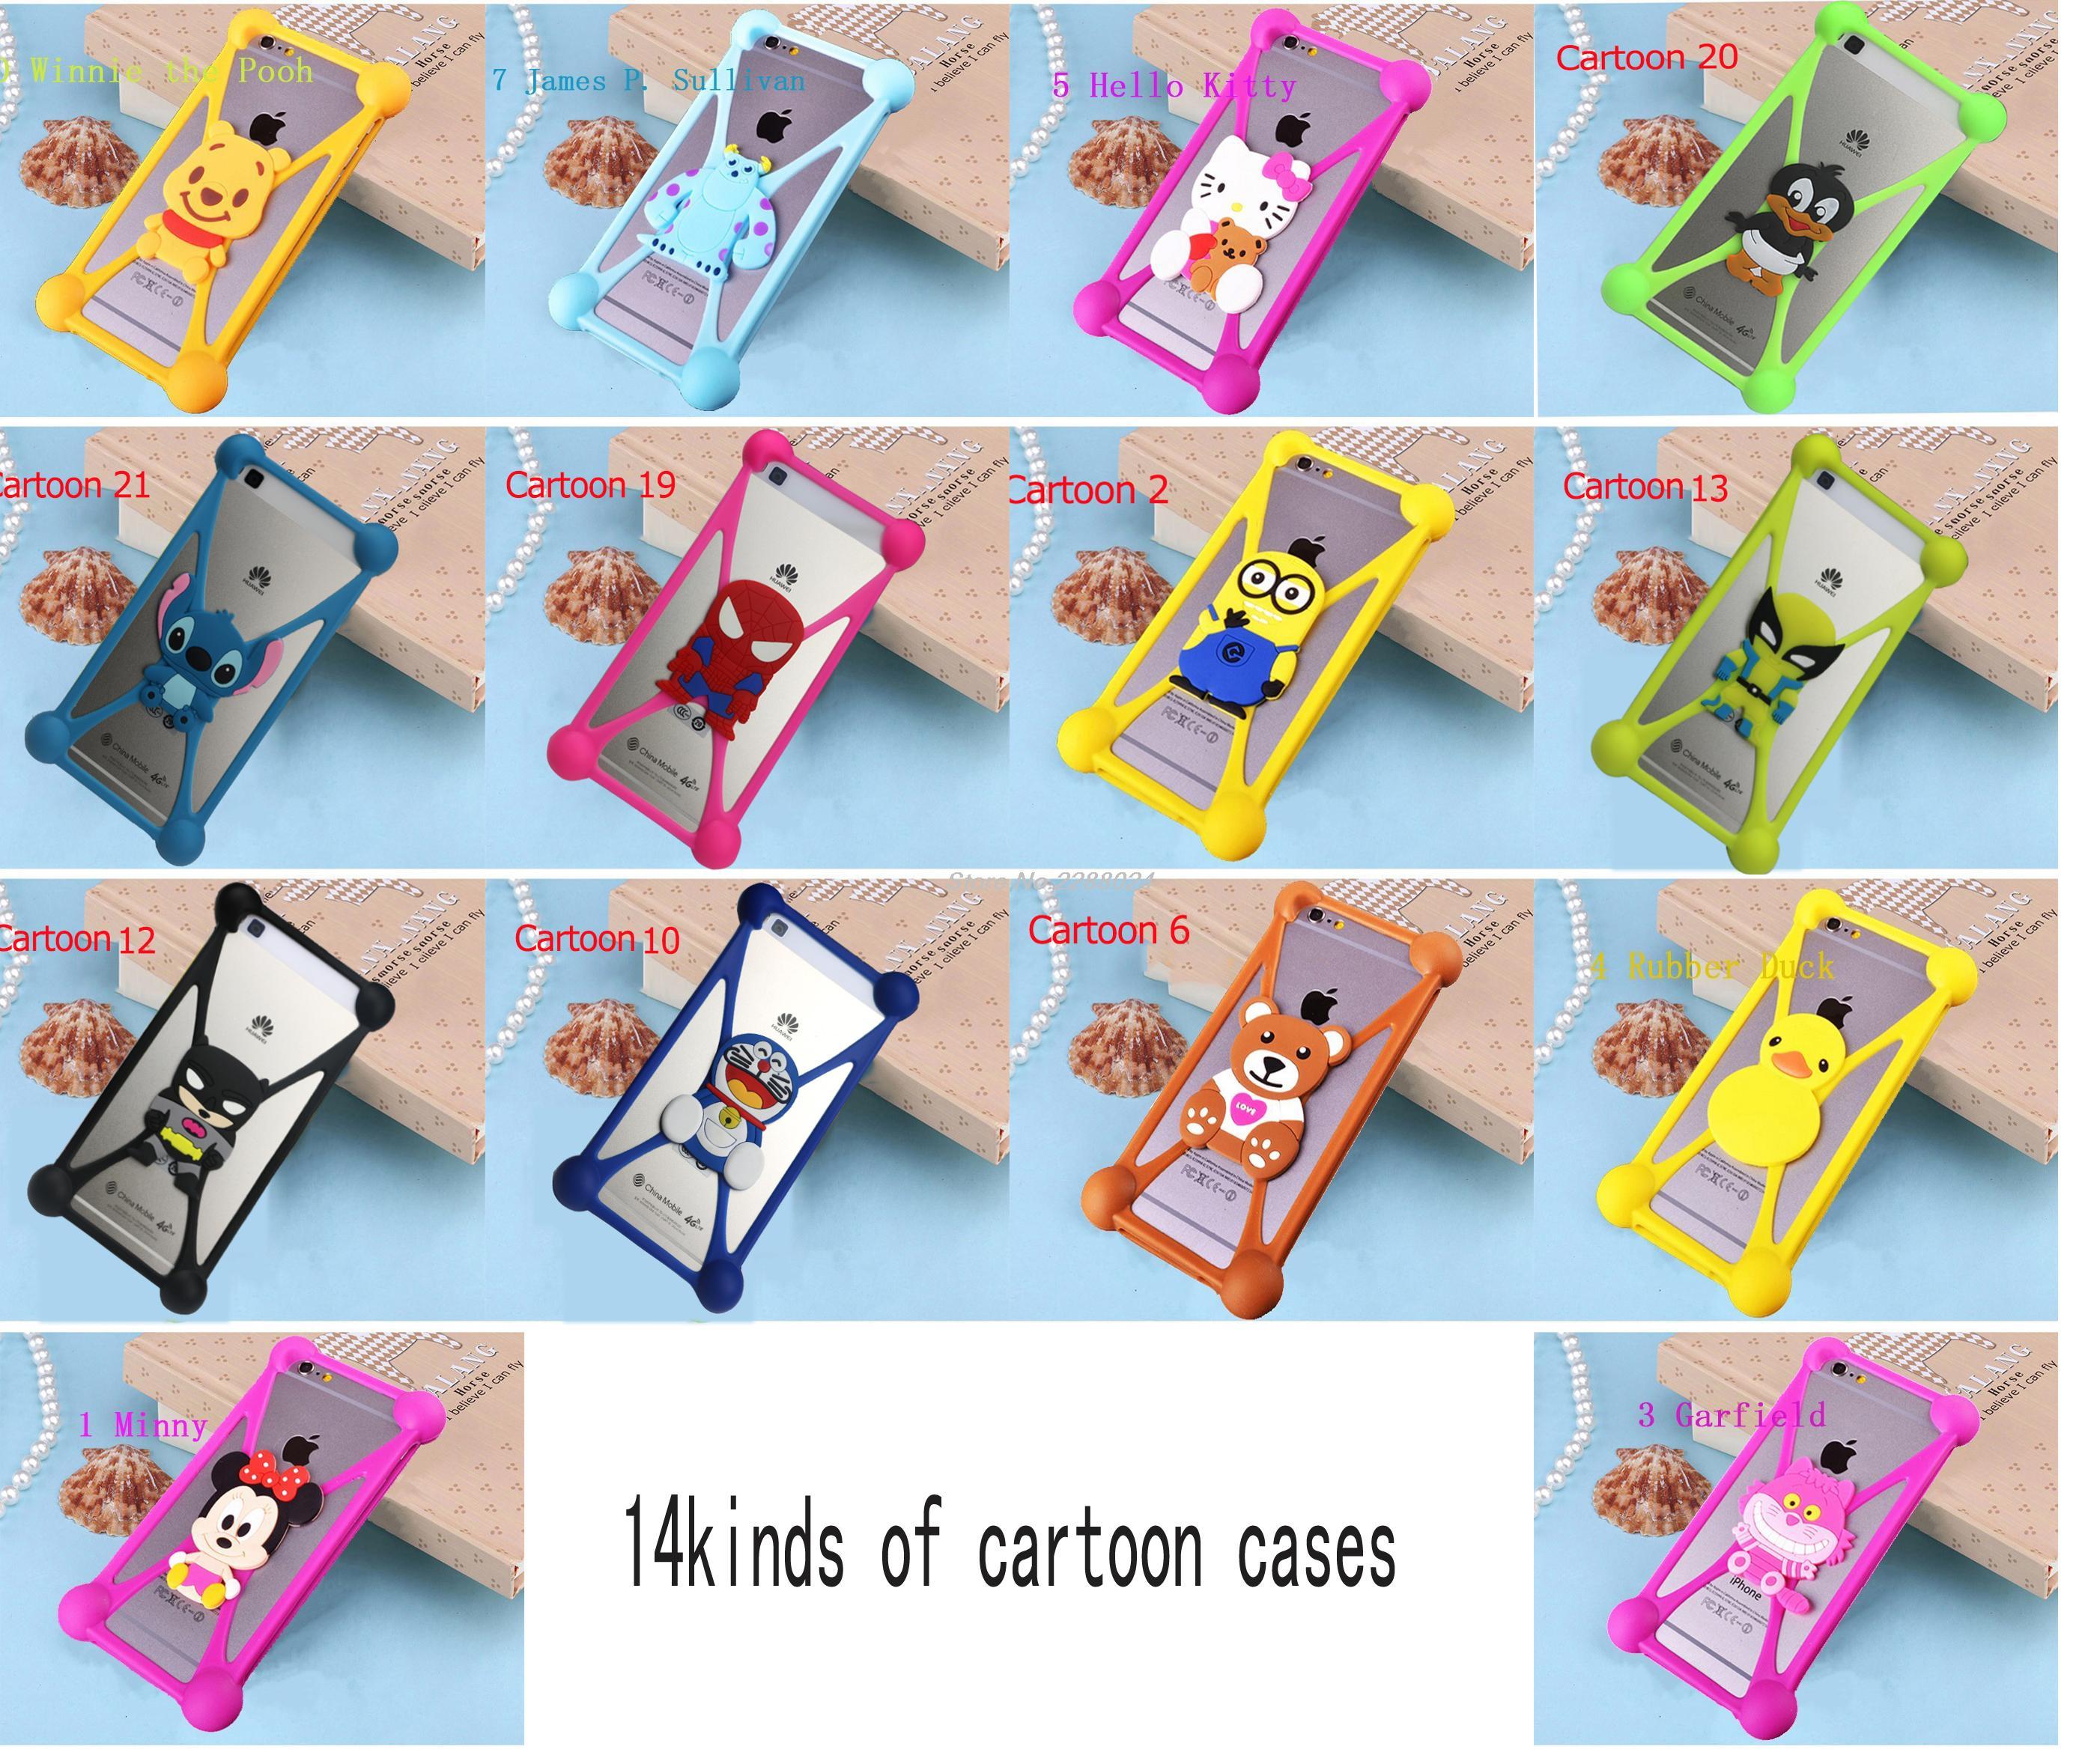 Cheap Price Soft Silicon Phone Cover Case For Prestigio 3400 3530 5455 3450 4055 5450 5454 Duo Pap 7500 Cute Cartoon Frame